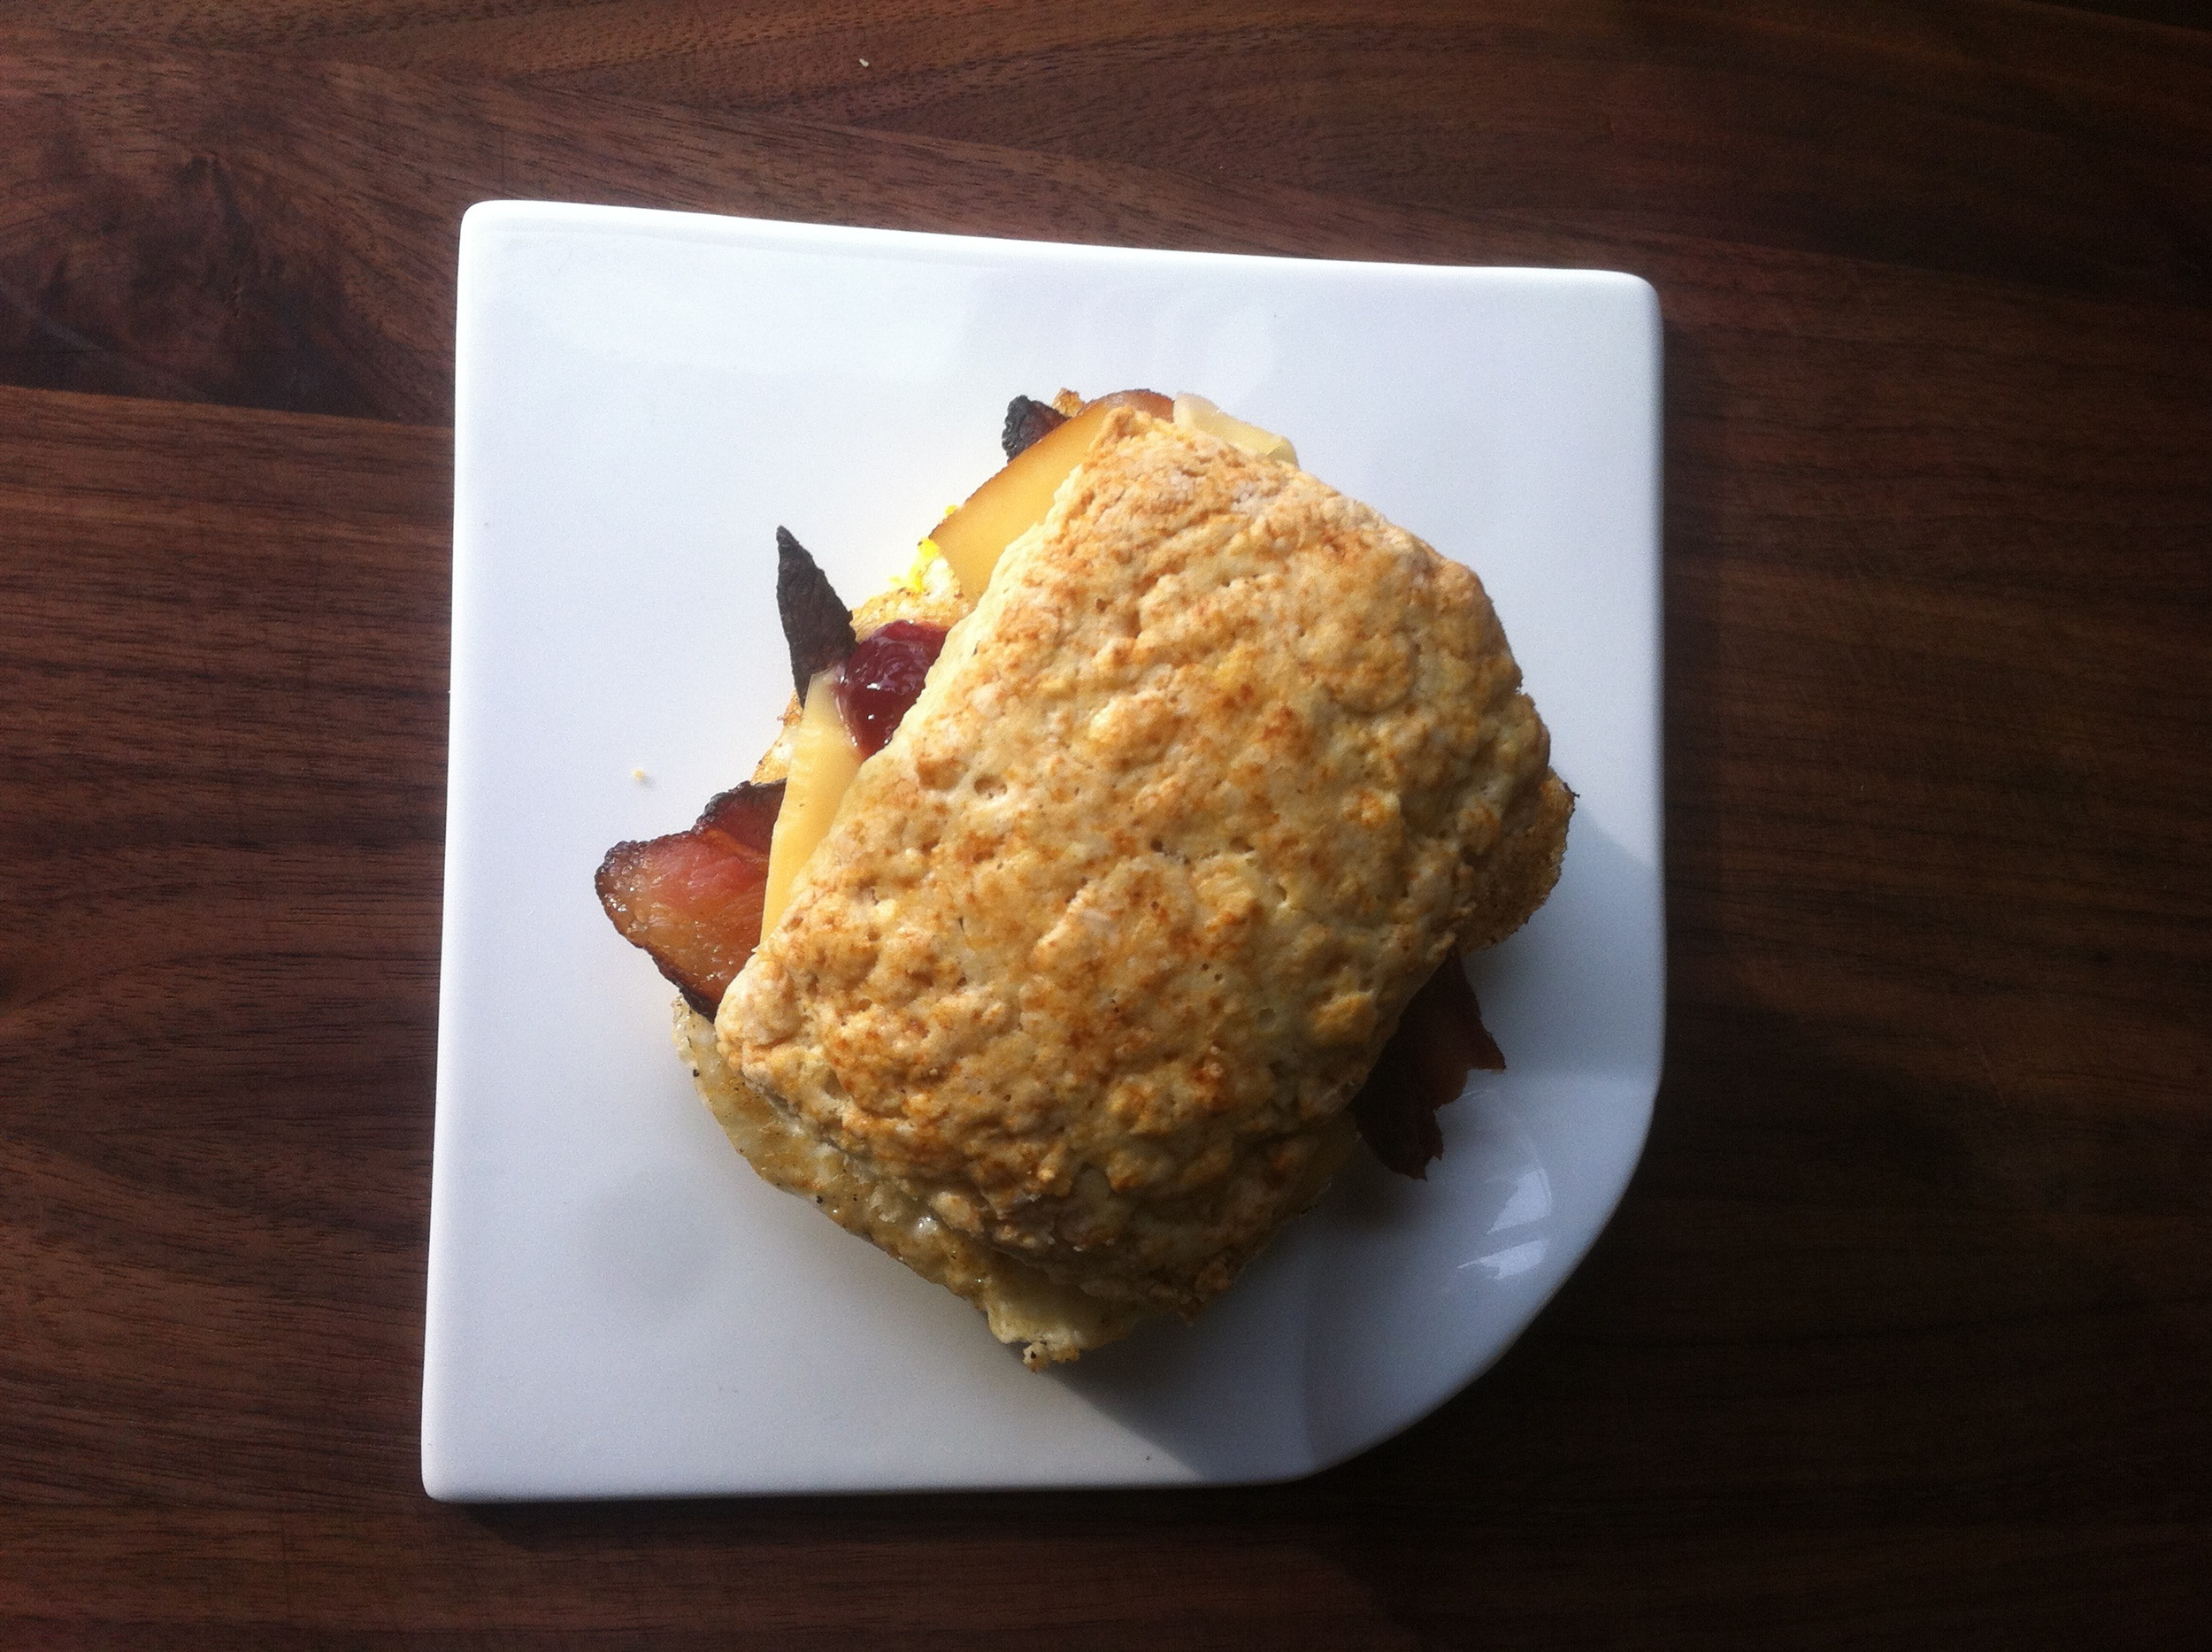 Golden brown Co catering biscuit sandwich.jpg